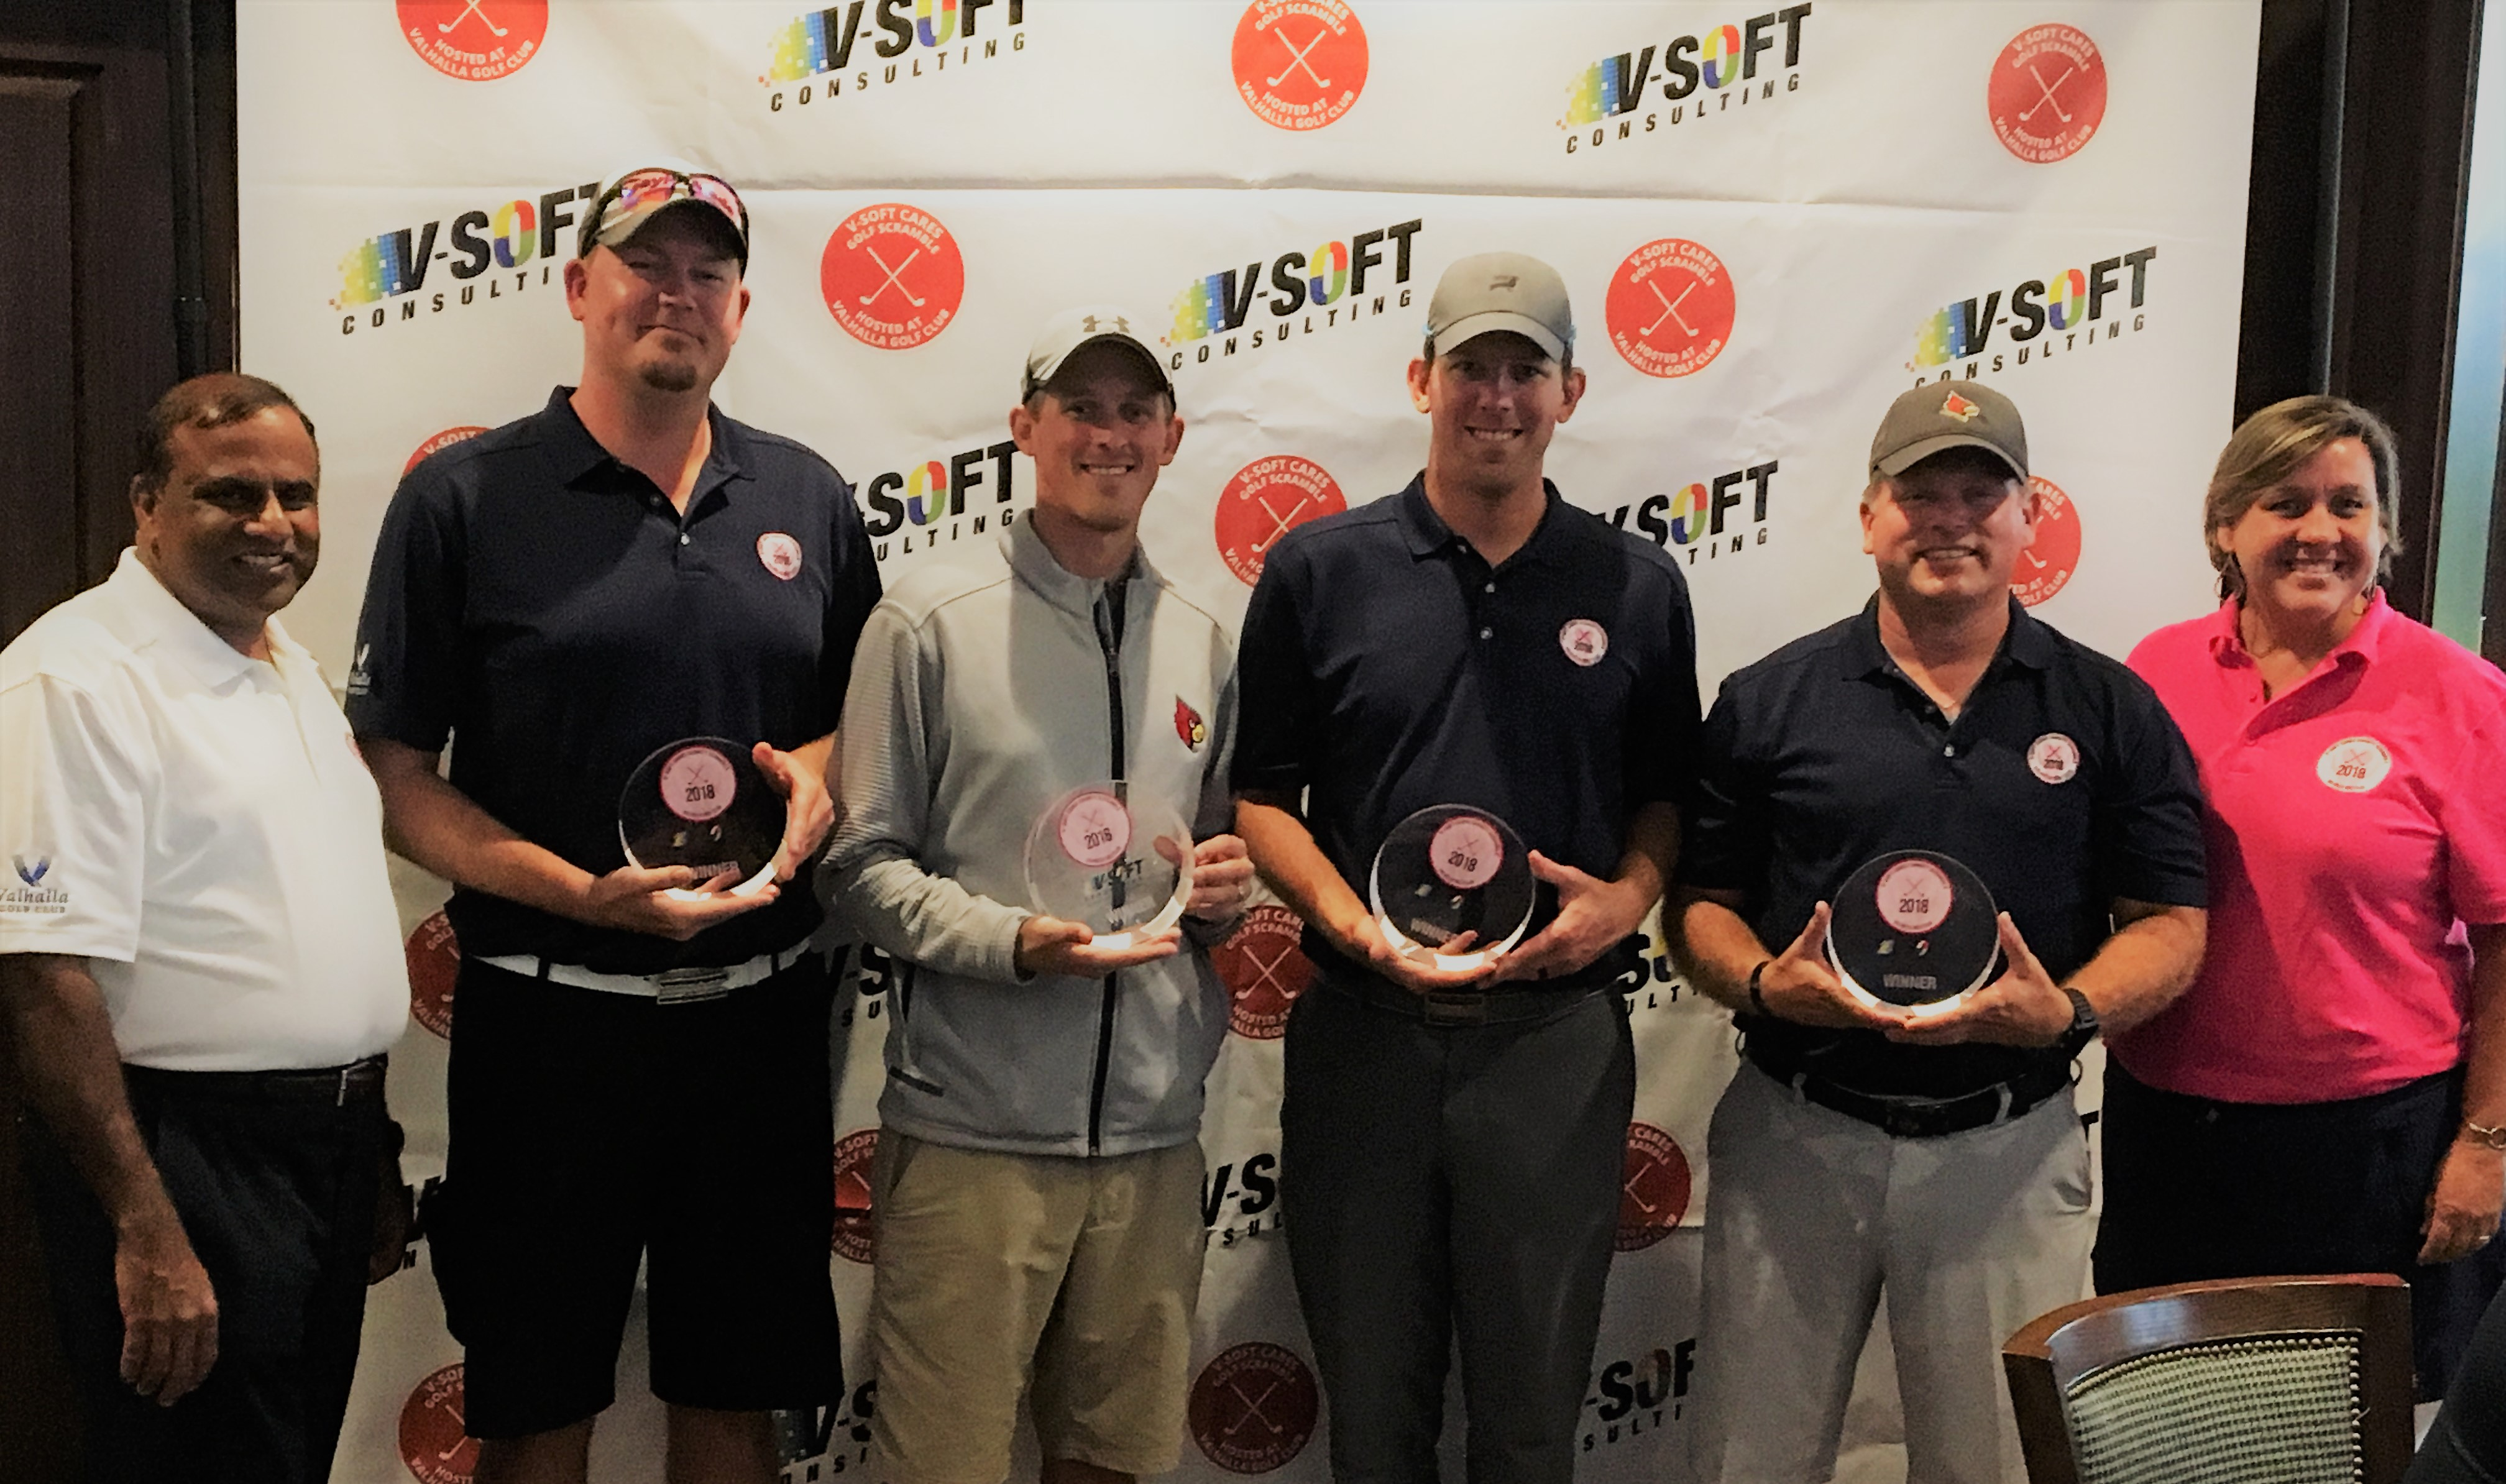 Winners golf scramble